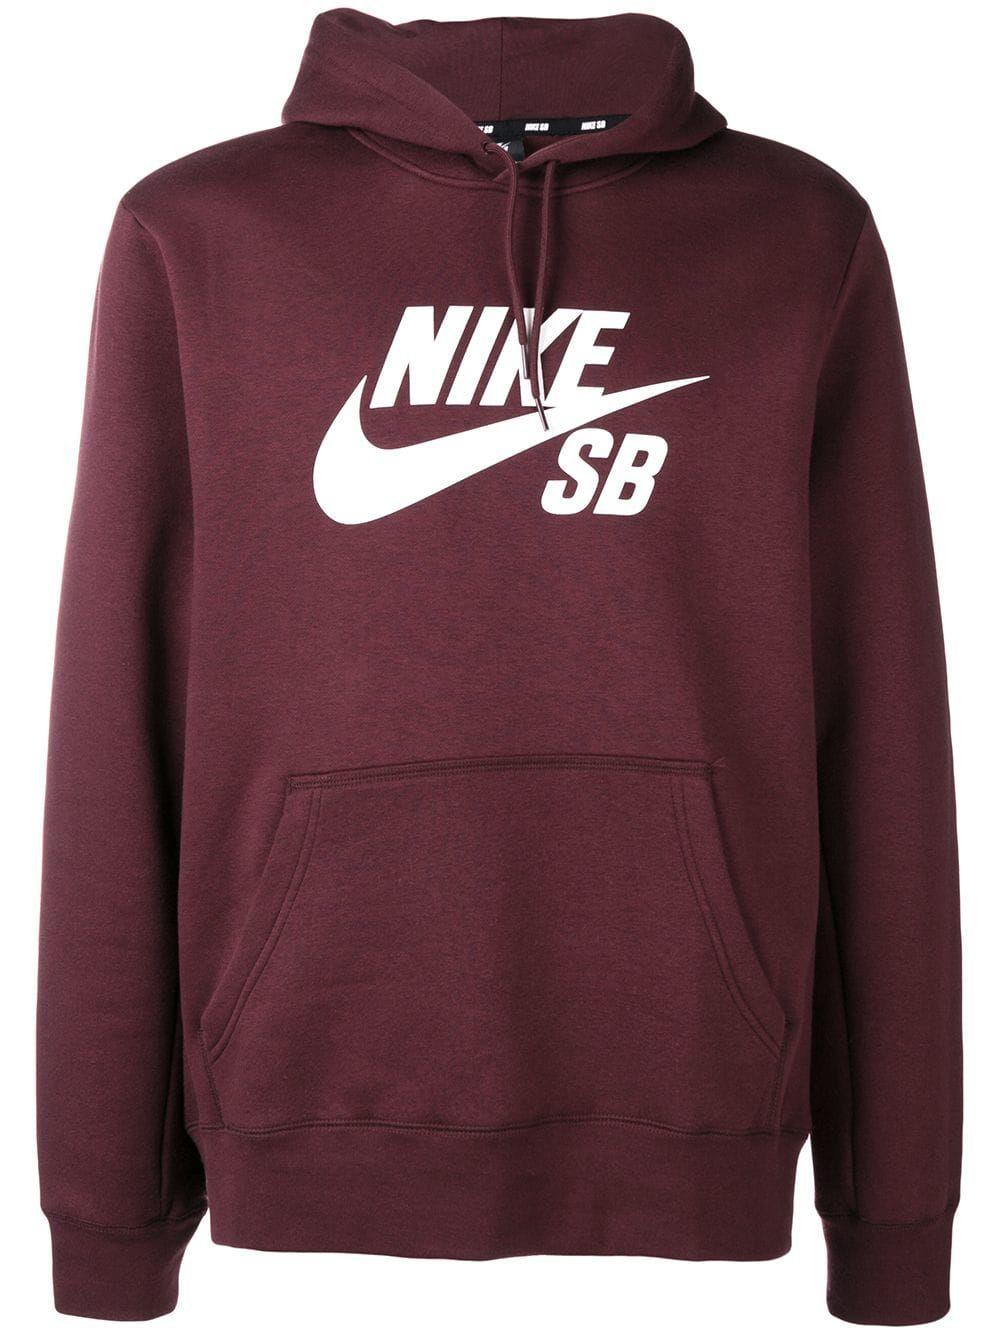 Nike Nike Sb Icon Pullover Hoodie Red Nike Cloth [ 1334 x 1000 Pixel ]